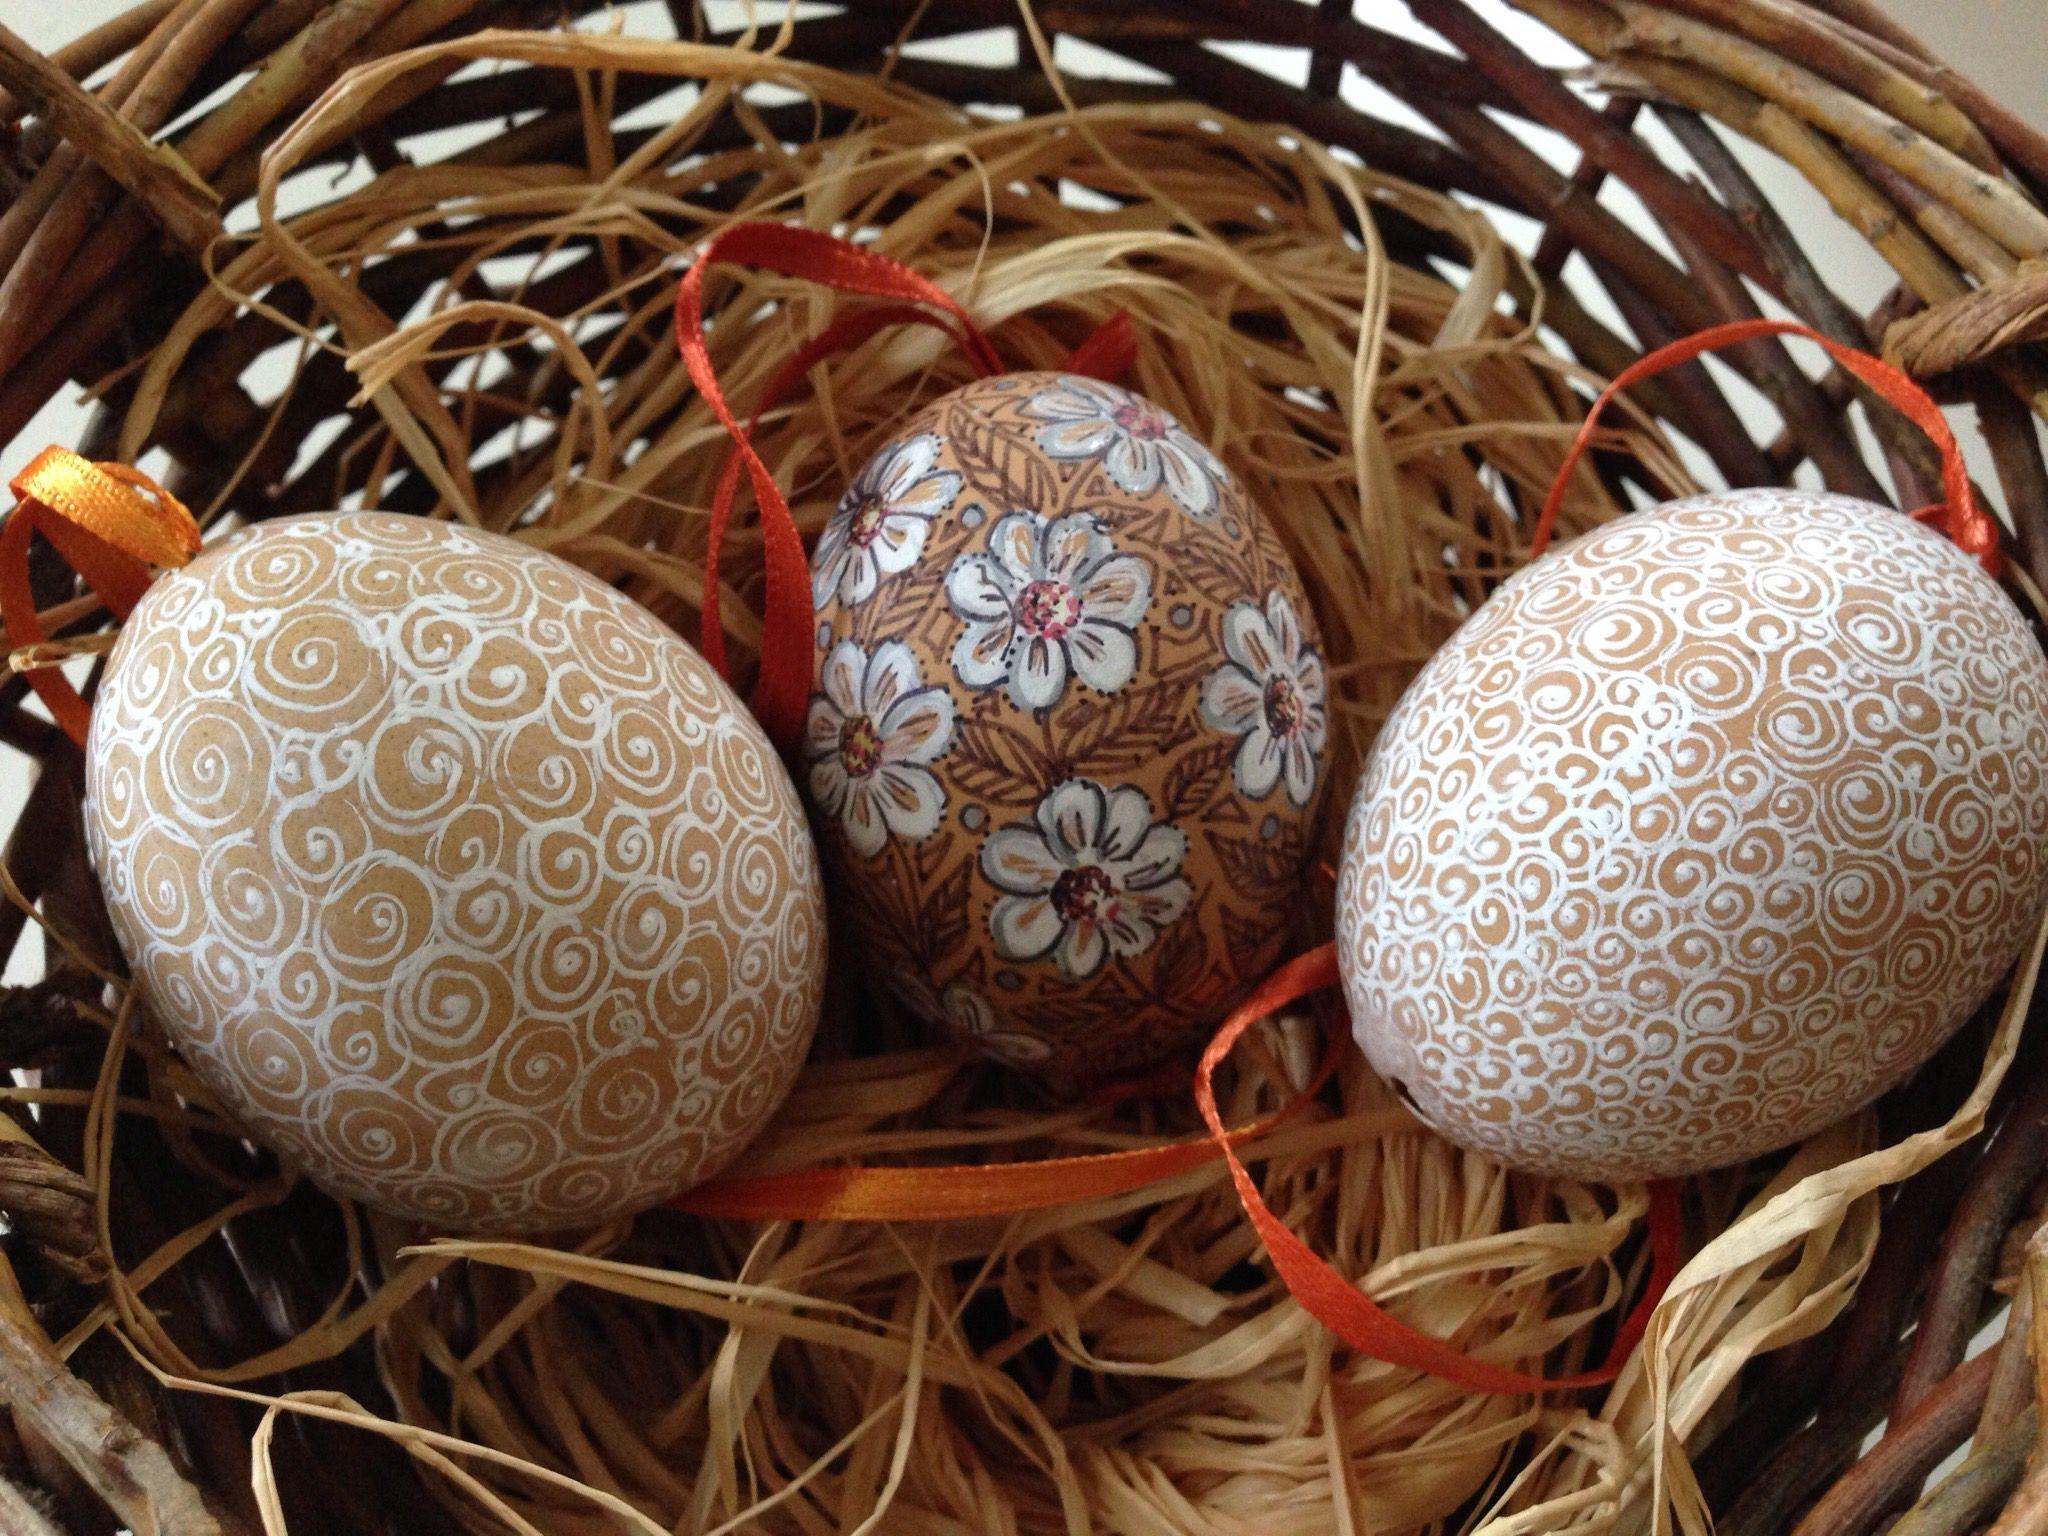 Gabriele Starke: Painted eggs using Sharpies